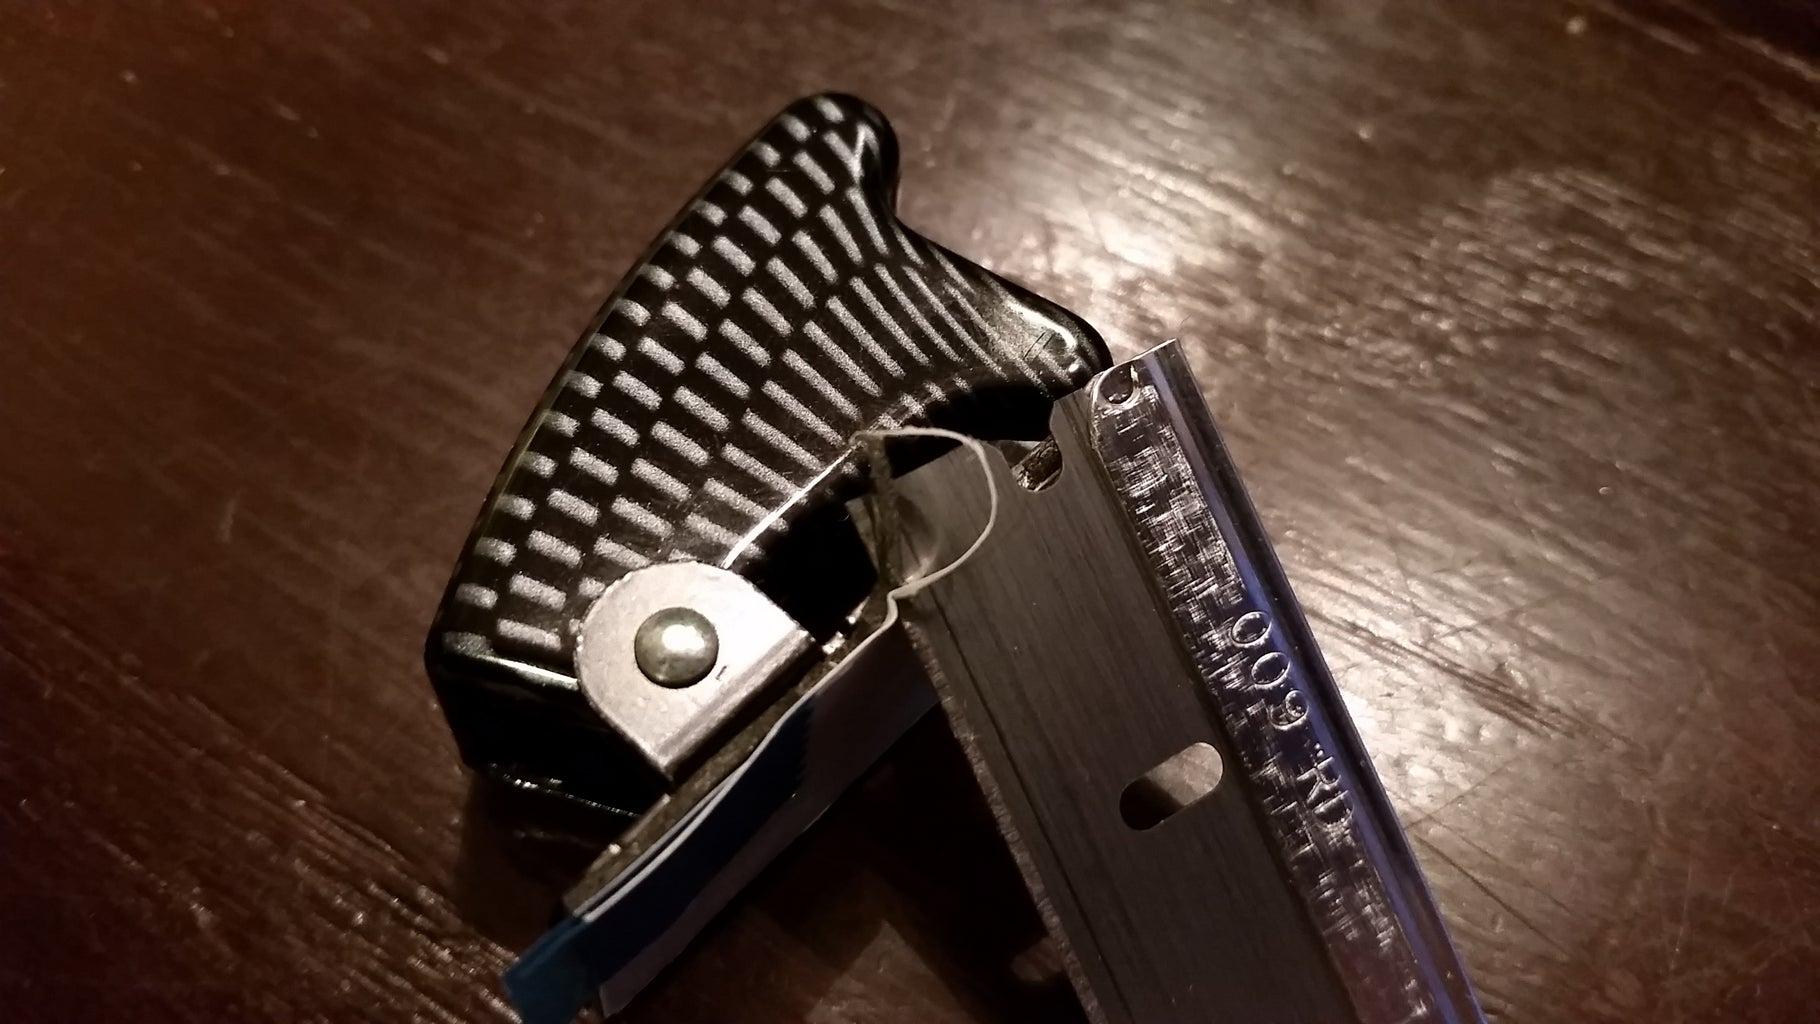 Servo Tape, Cutting, Trimming, and Presto